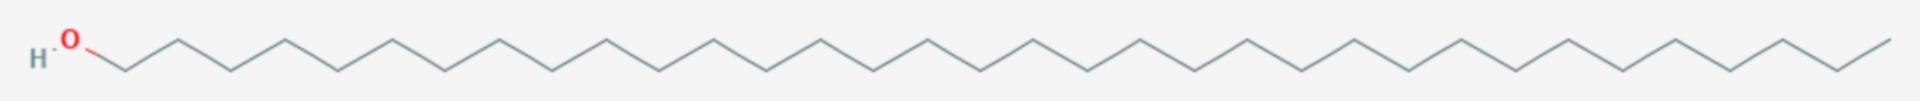 1-Tetratriacontanol (Strukturformel)